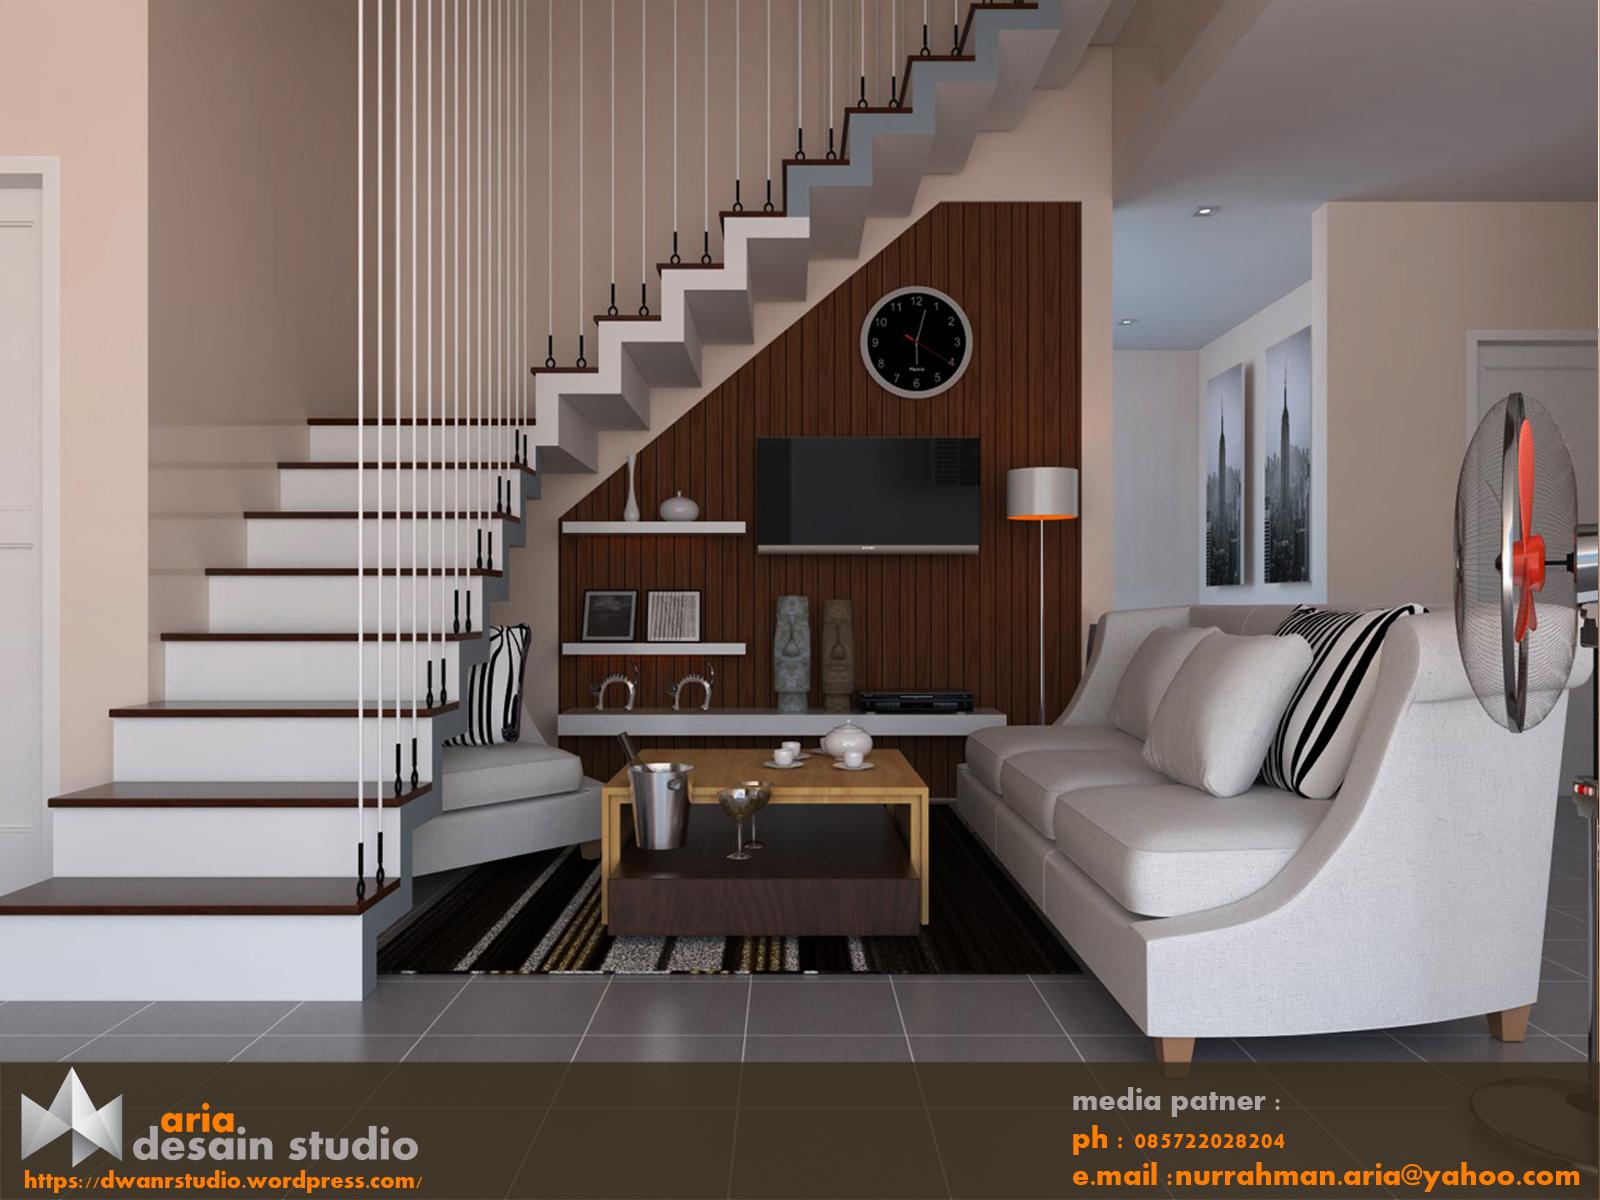 Jasa bikin rumah desain rumah desain interior desain